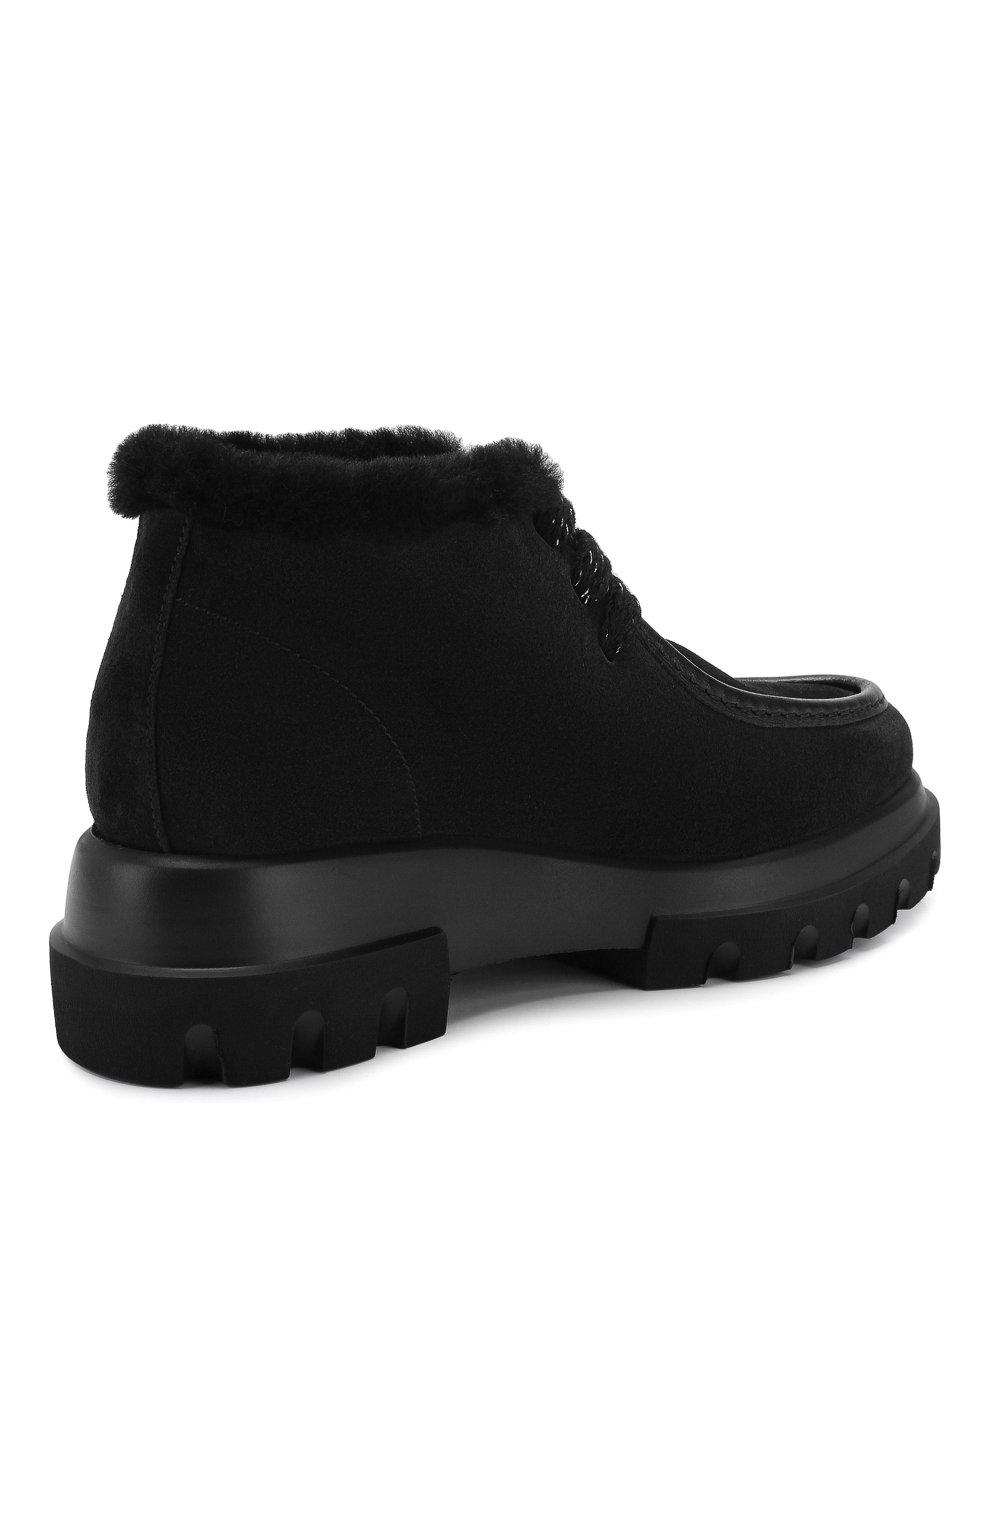 Женские замшевые ботинки PERTINI черного цвета, арт. 192W16508C27 | Фото 4